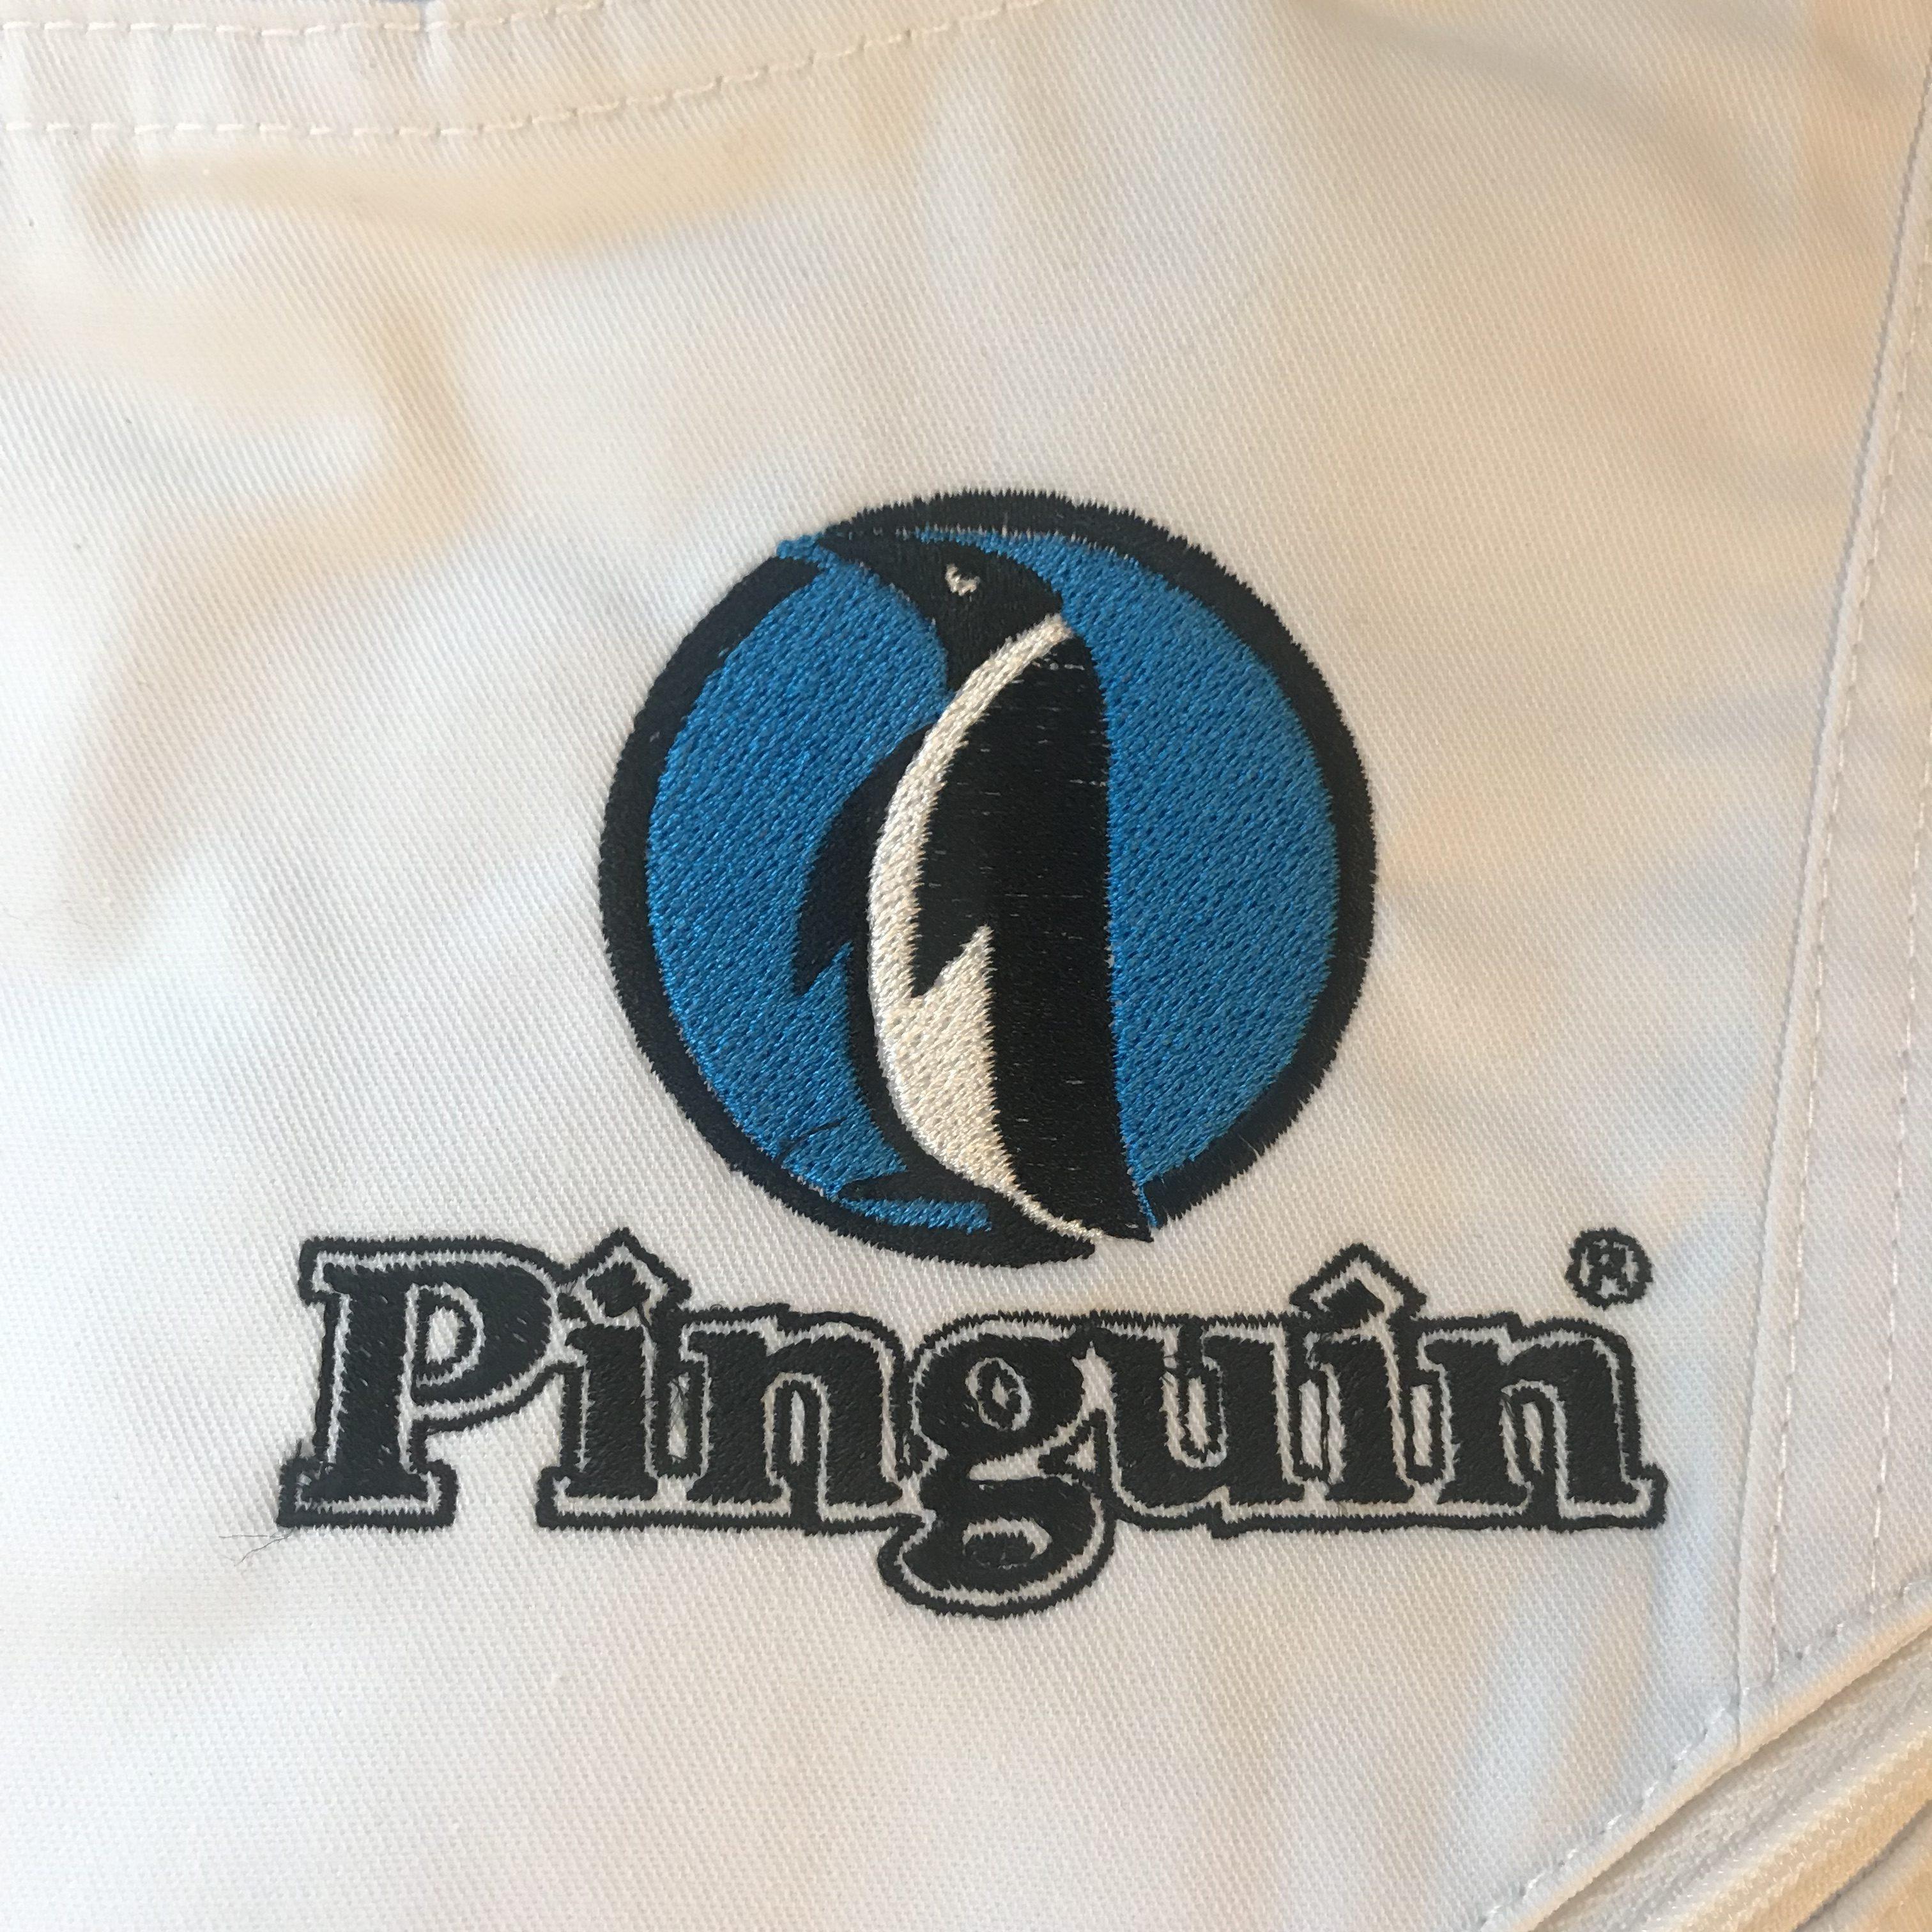 Greenyard Pinguin borduren op kleding